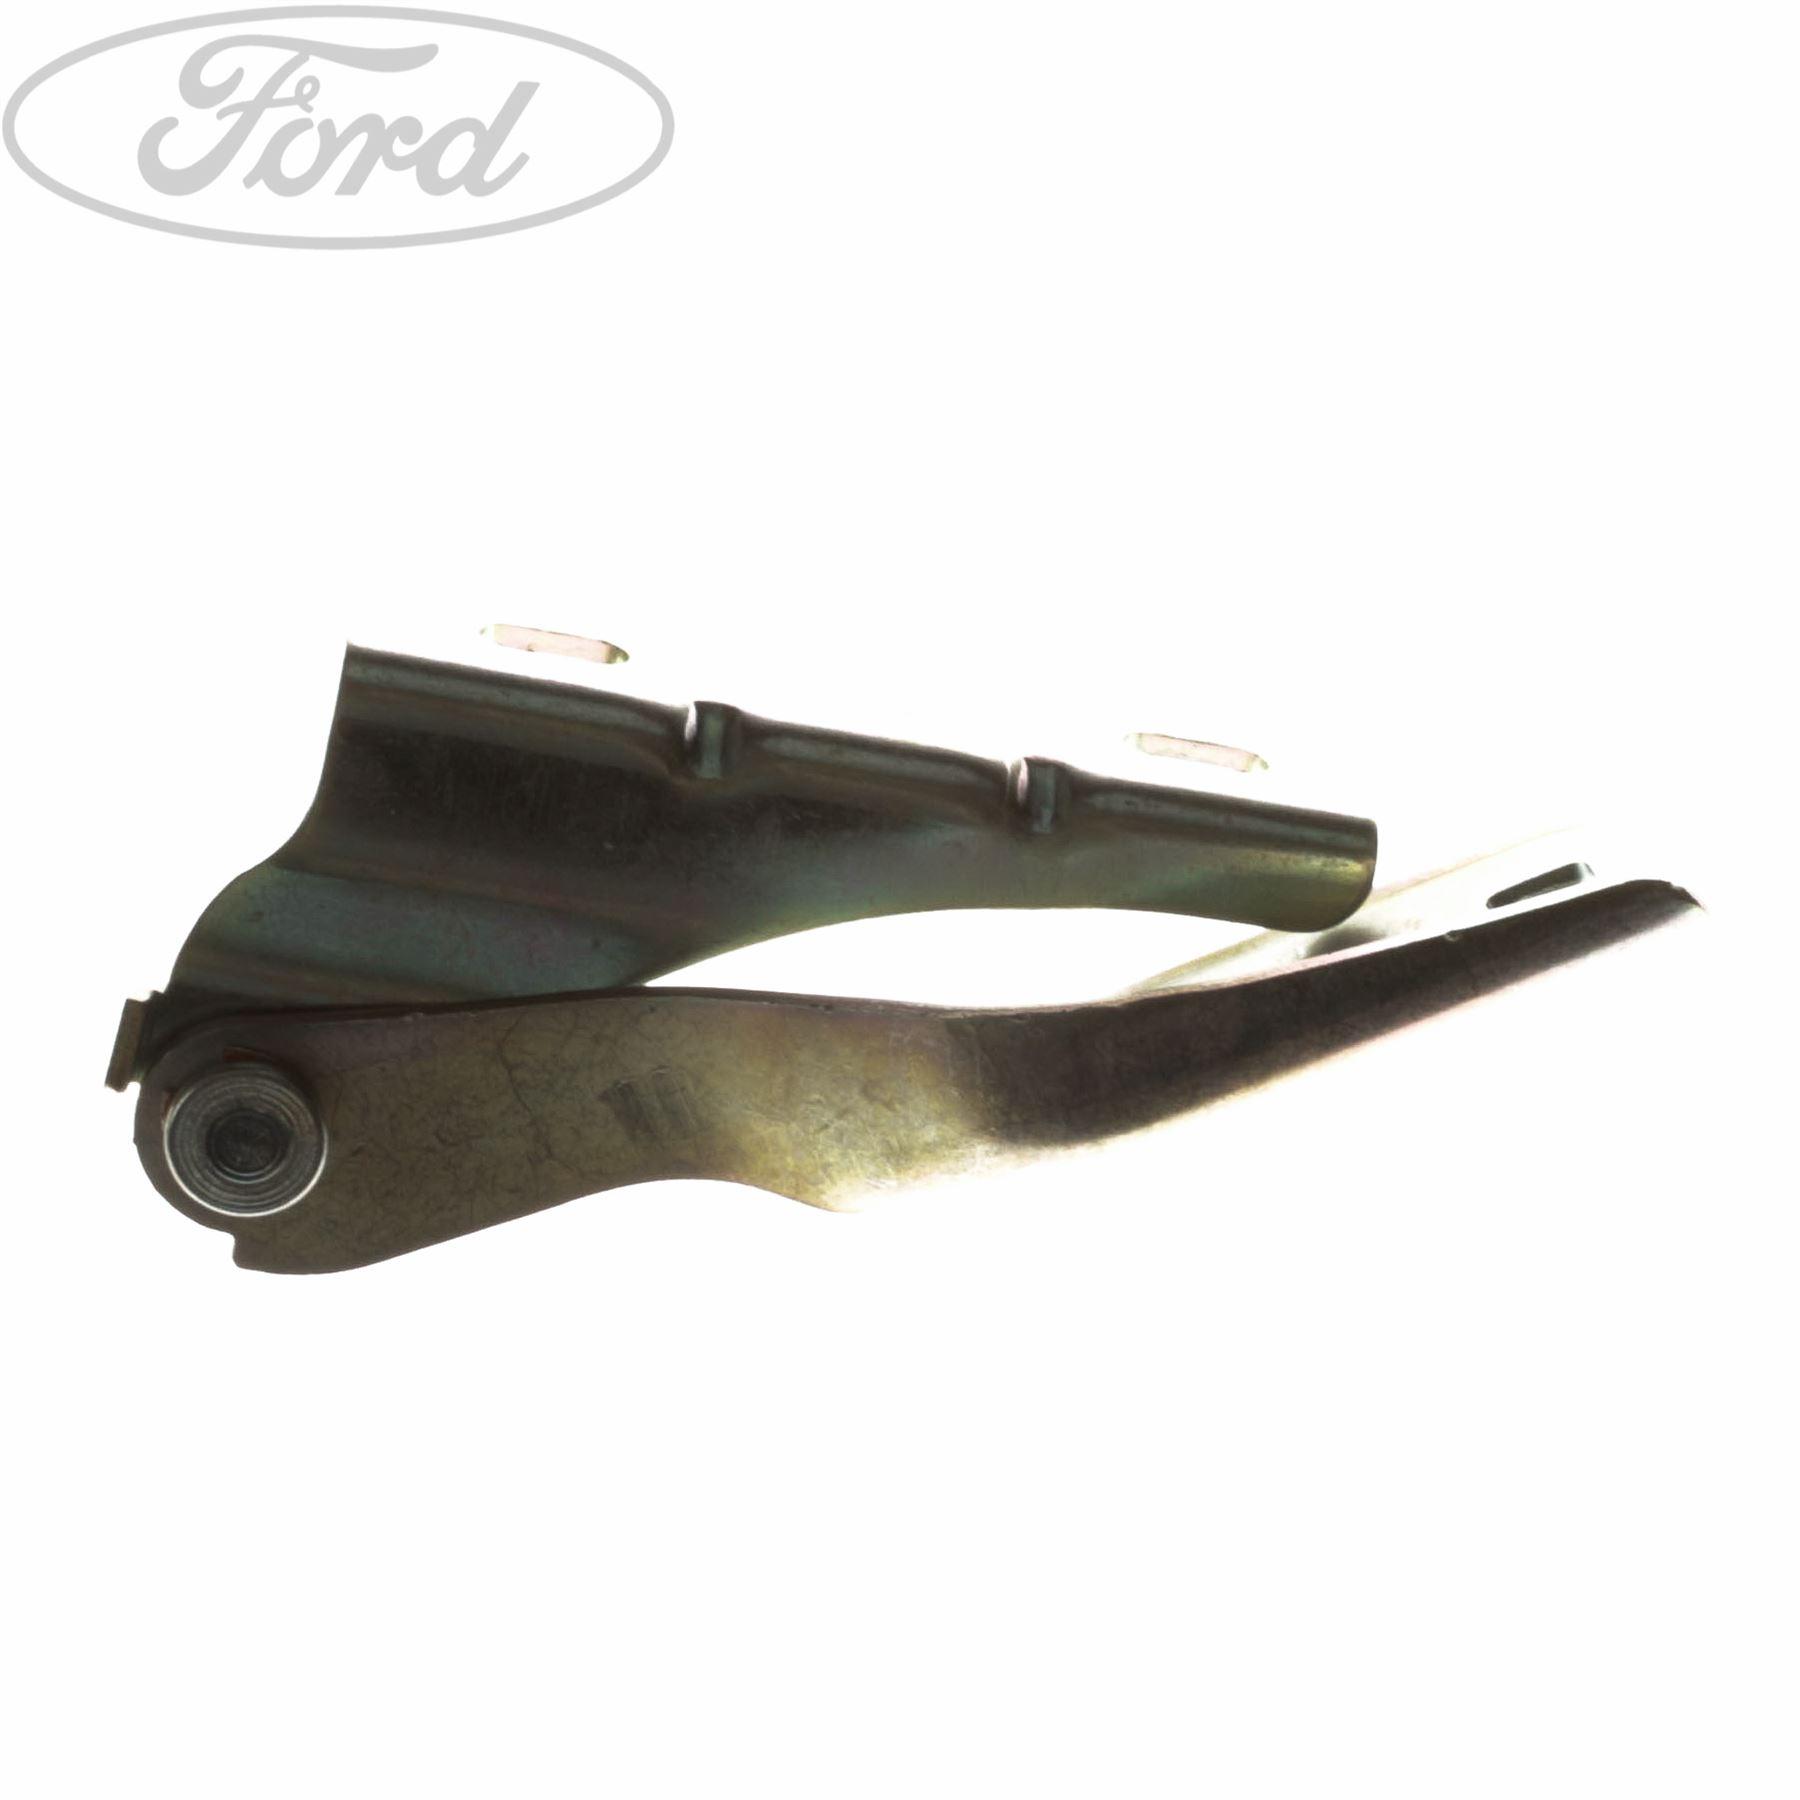 Steel 2006-2013 Ford Transit MK7 Chrome Capot Ventilation Hood Trim S